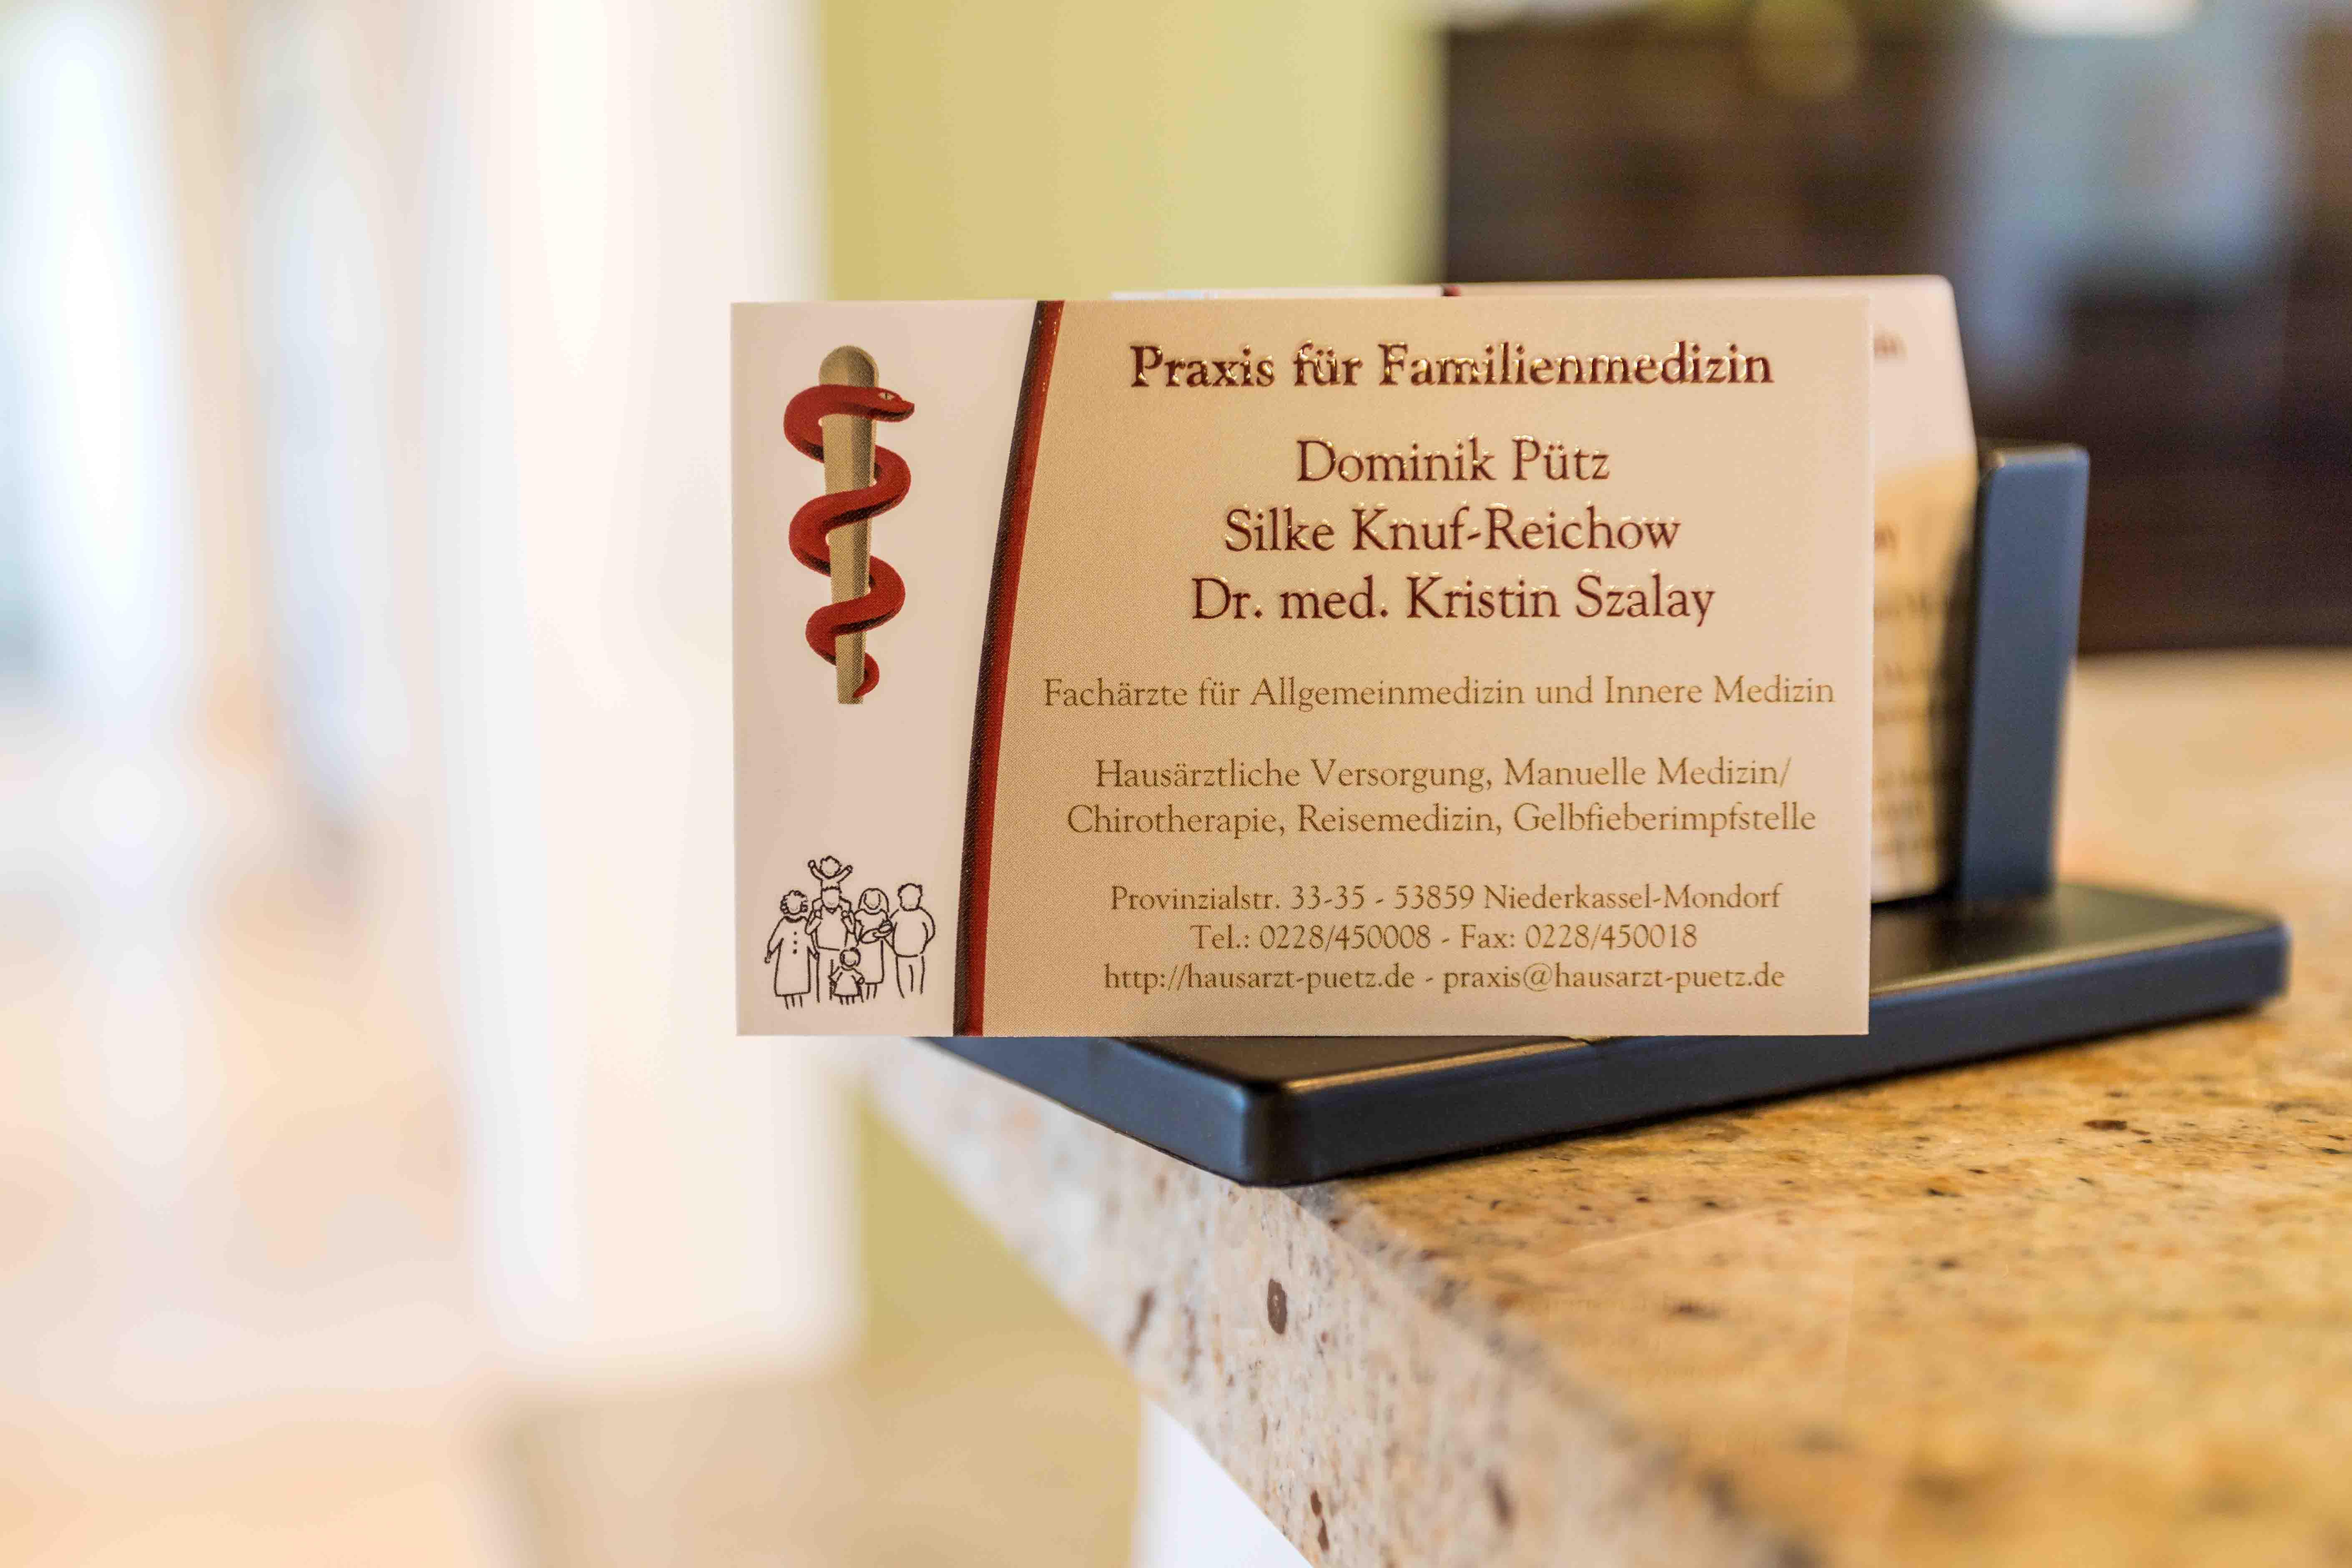 Praxis für Familienmedizin Dominik Pütz Niederkassel